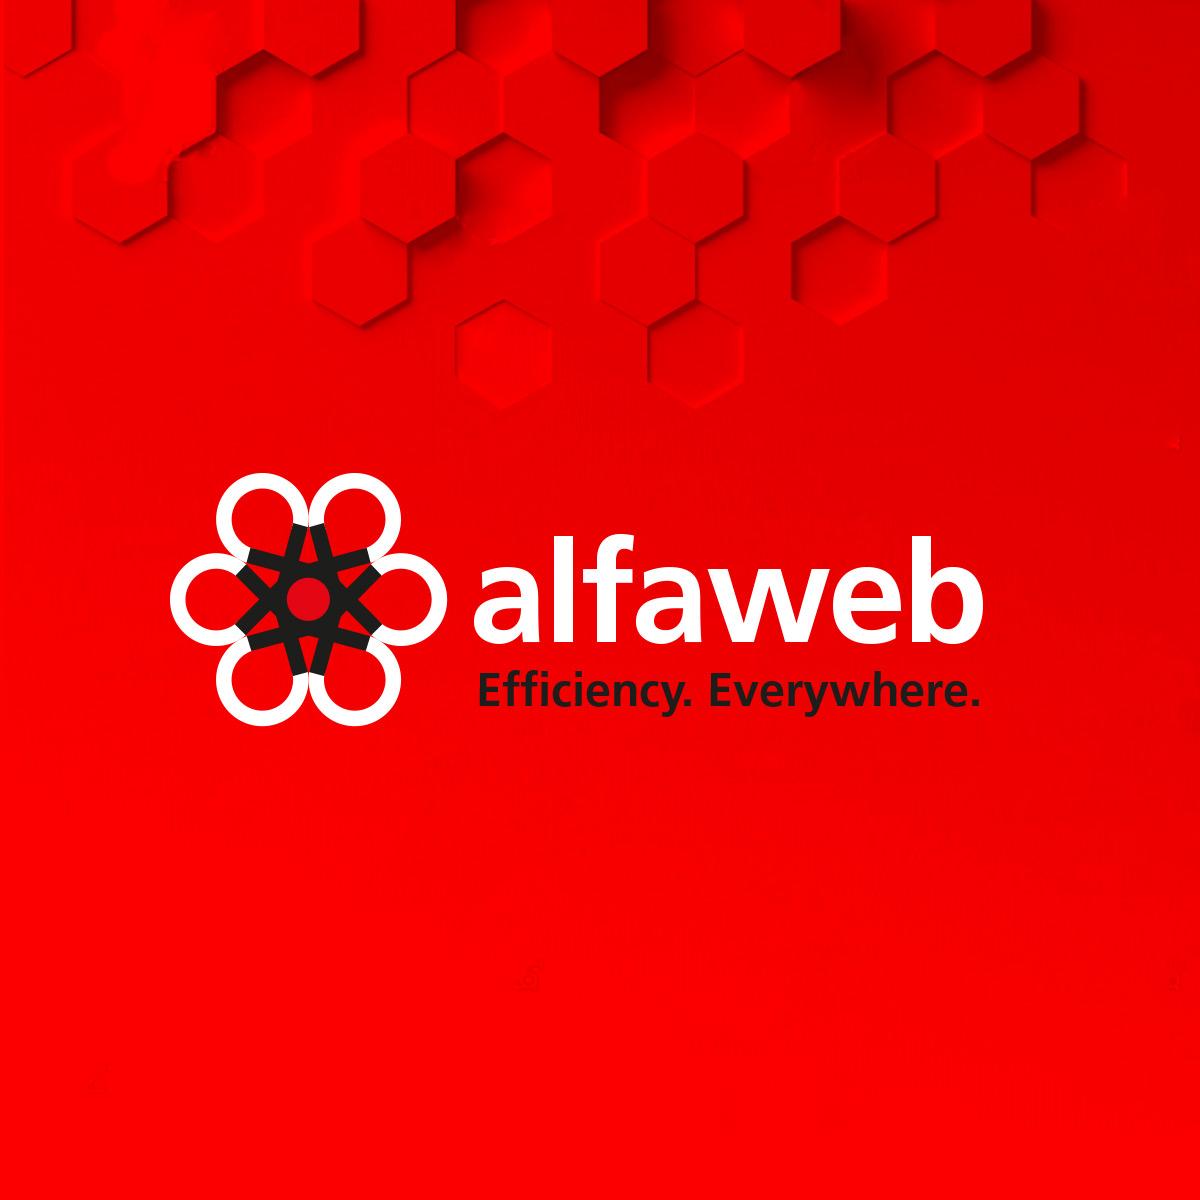 thumbs_alfaweb